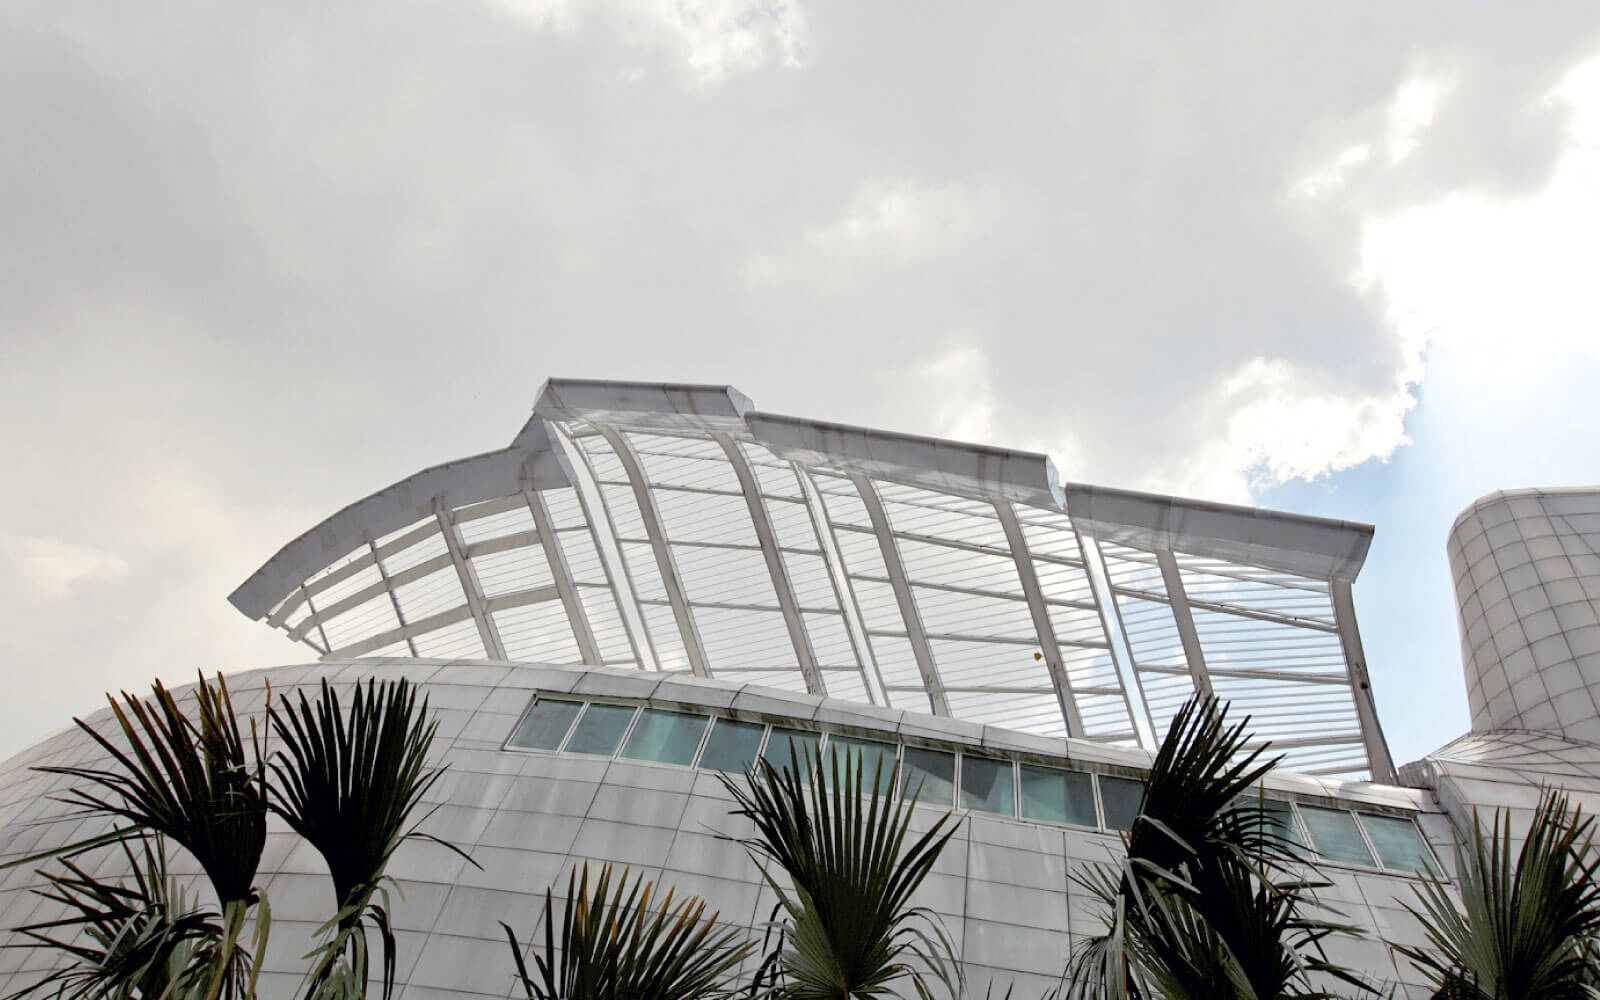 image 14 for Calvary center green architect design